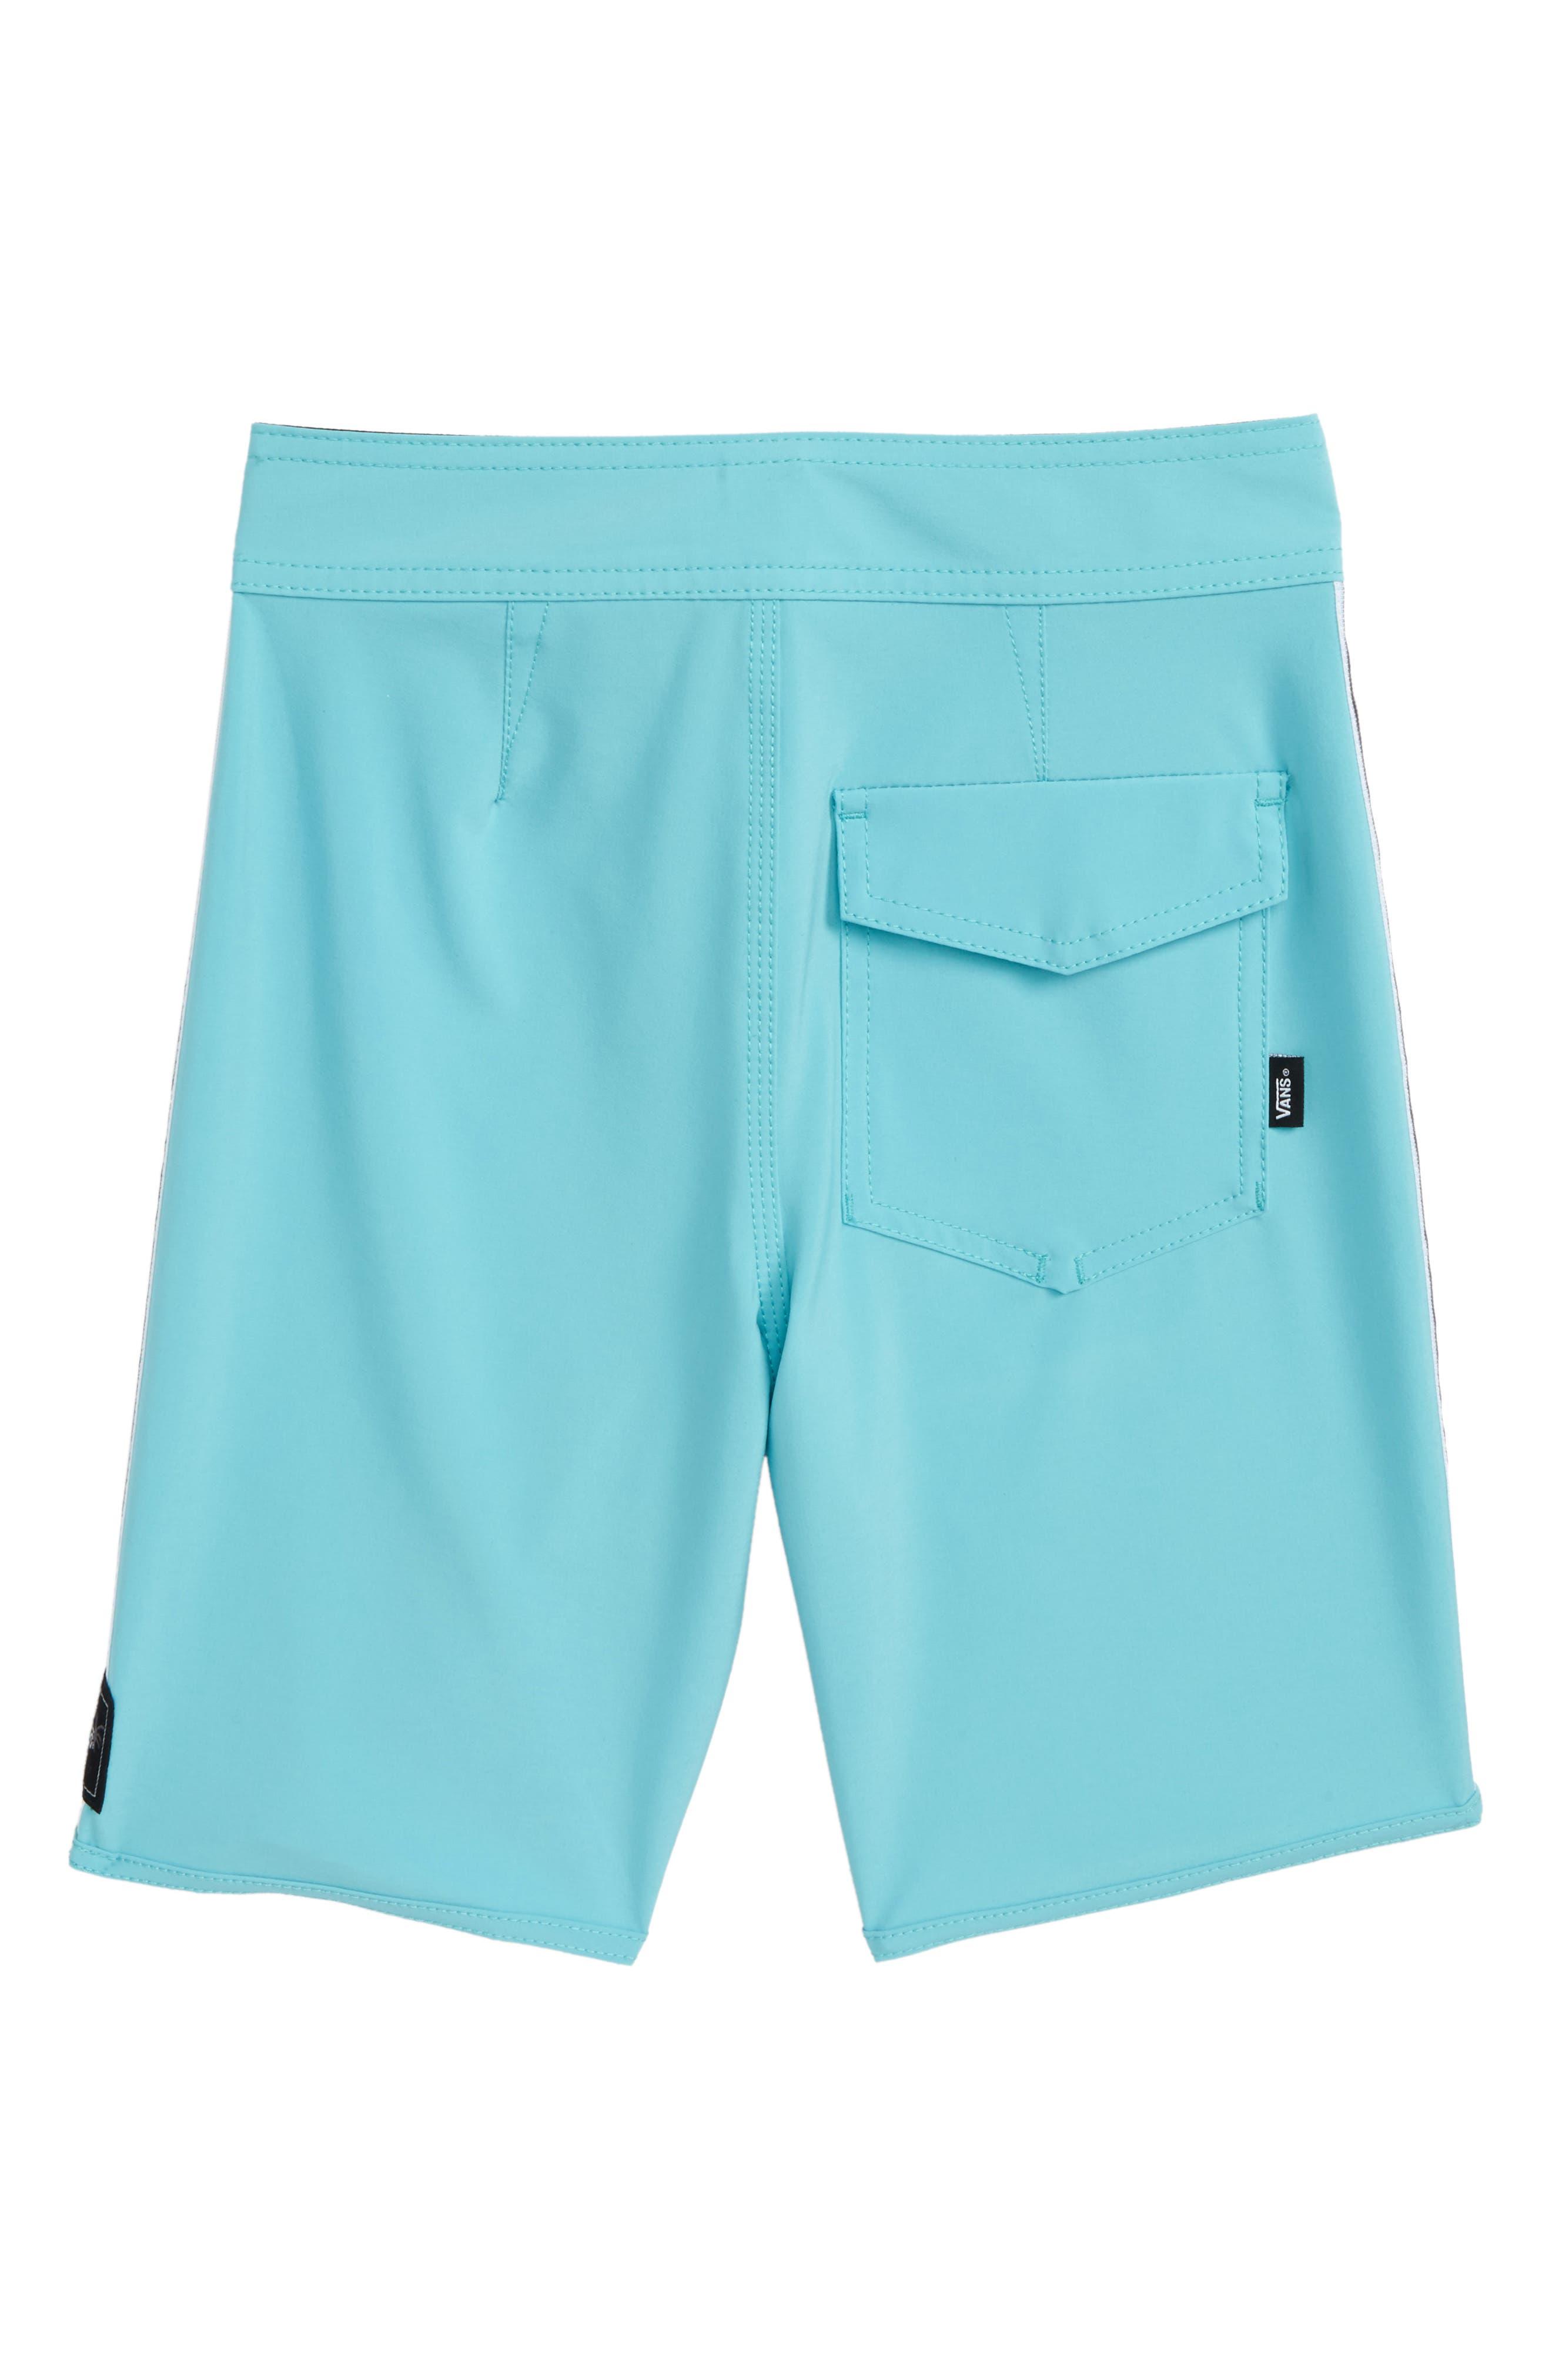 Sidestripe Board Shorts,                             Alternate thumbnail 2, color,